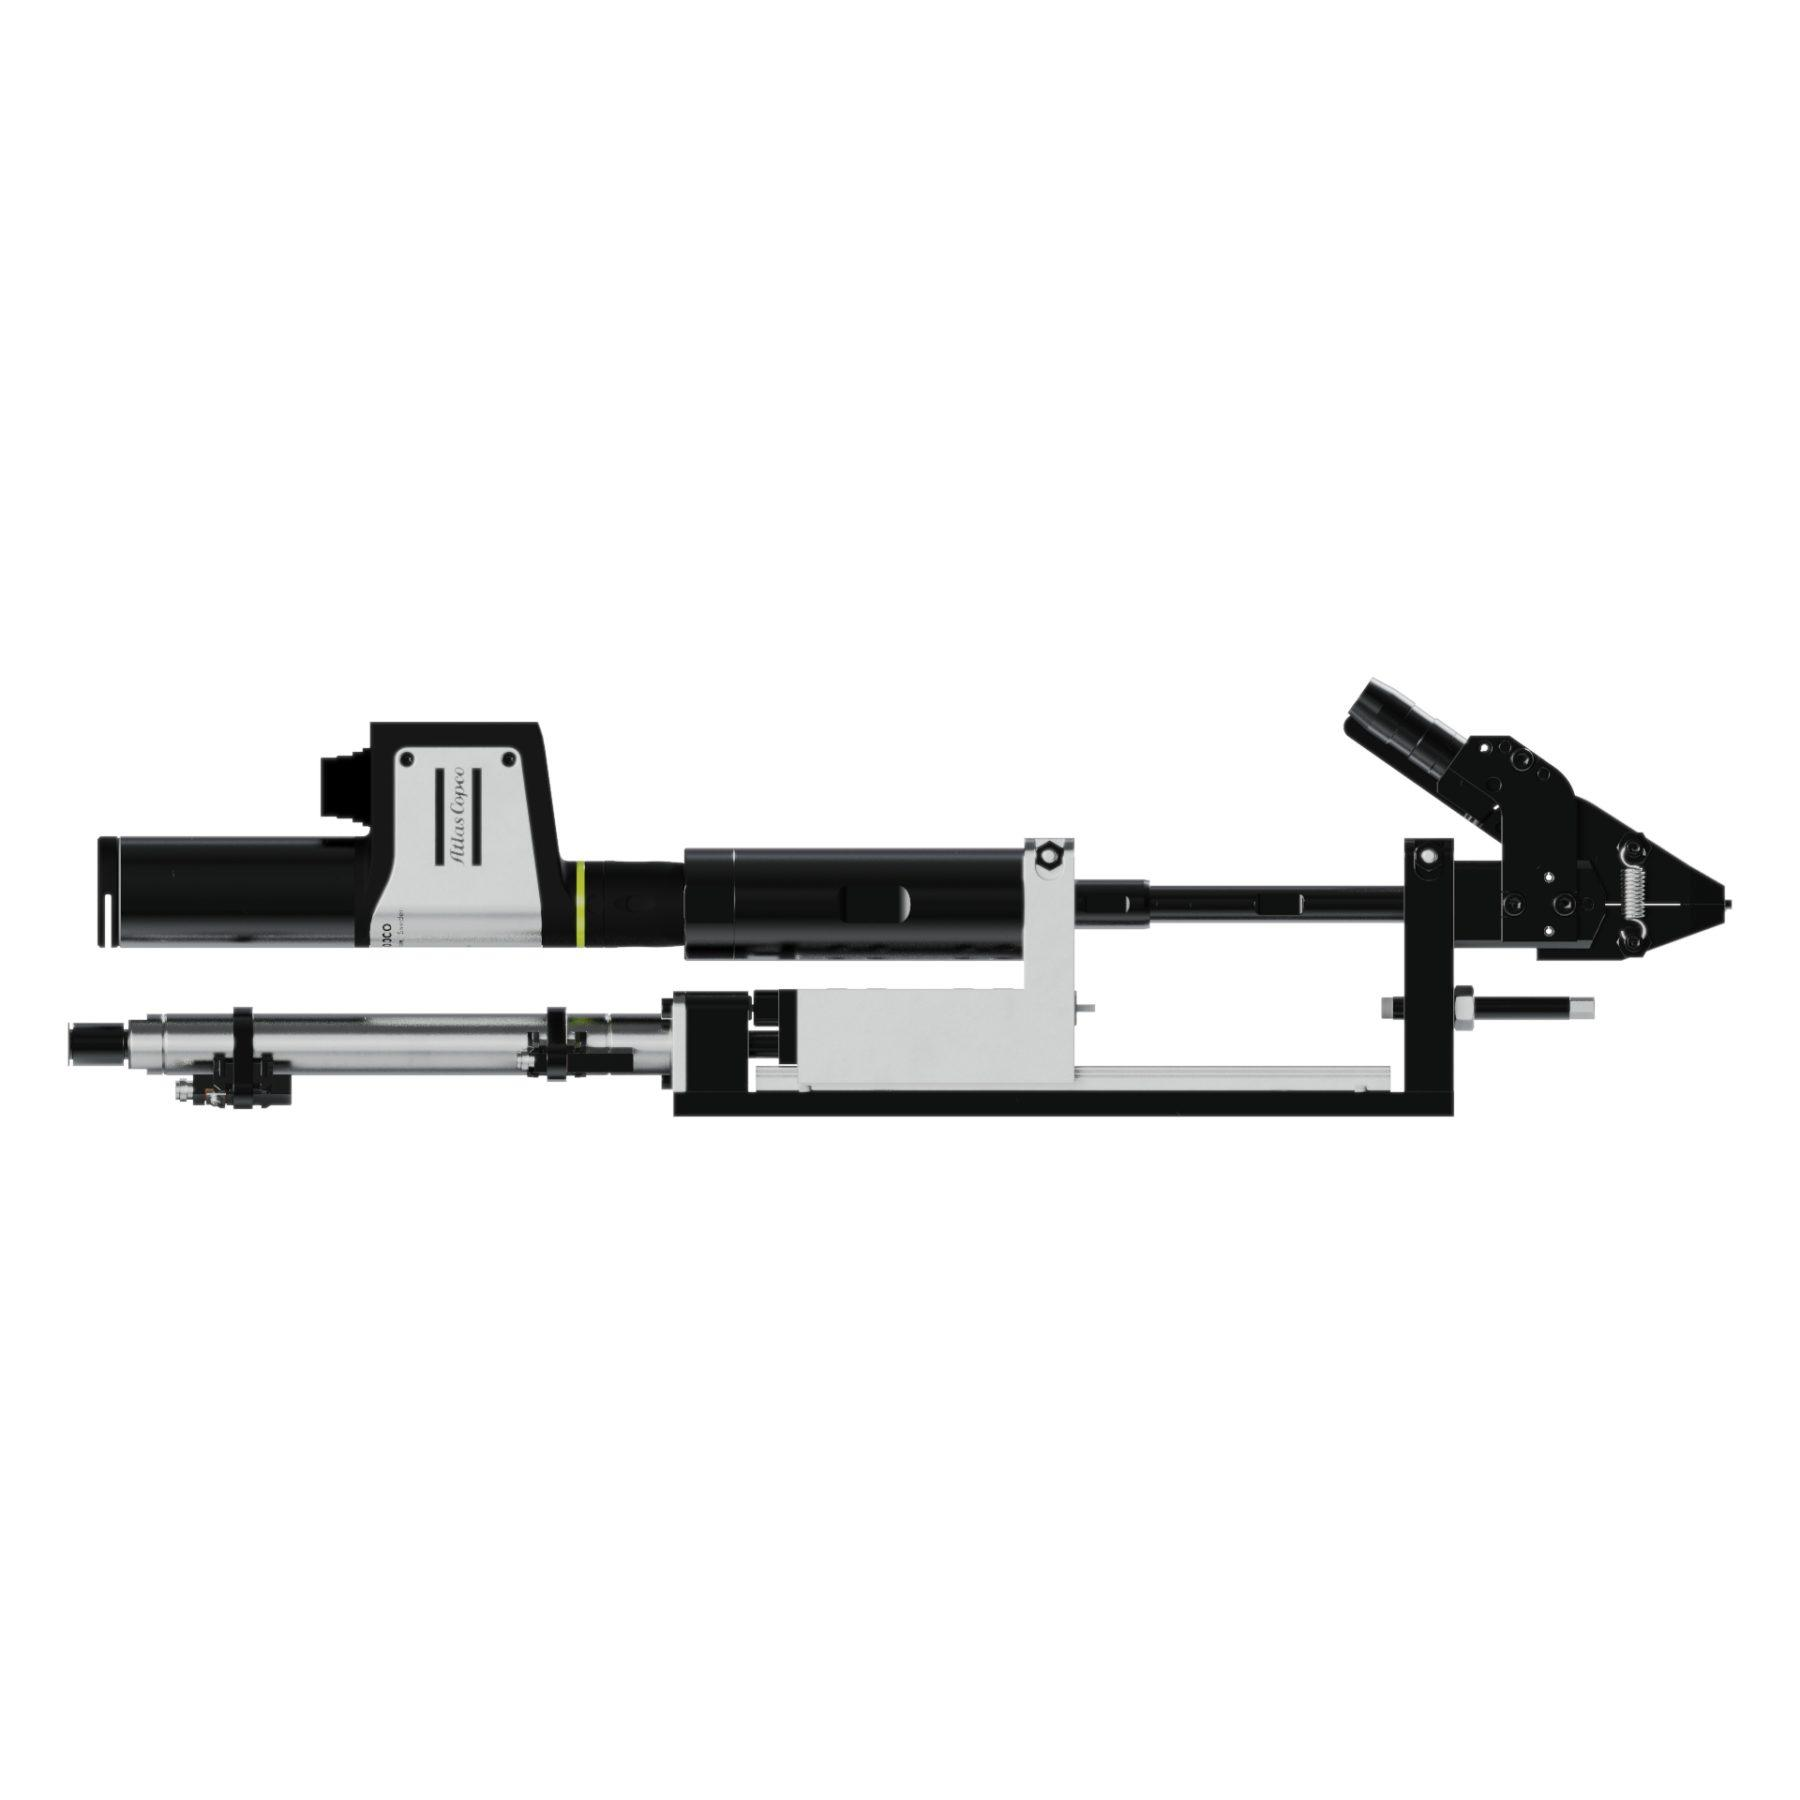 MiniMod Mini Automatic Screwdriver Head Type 6 Side 2